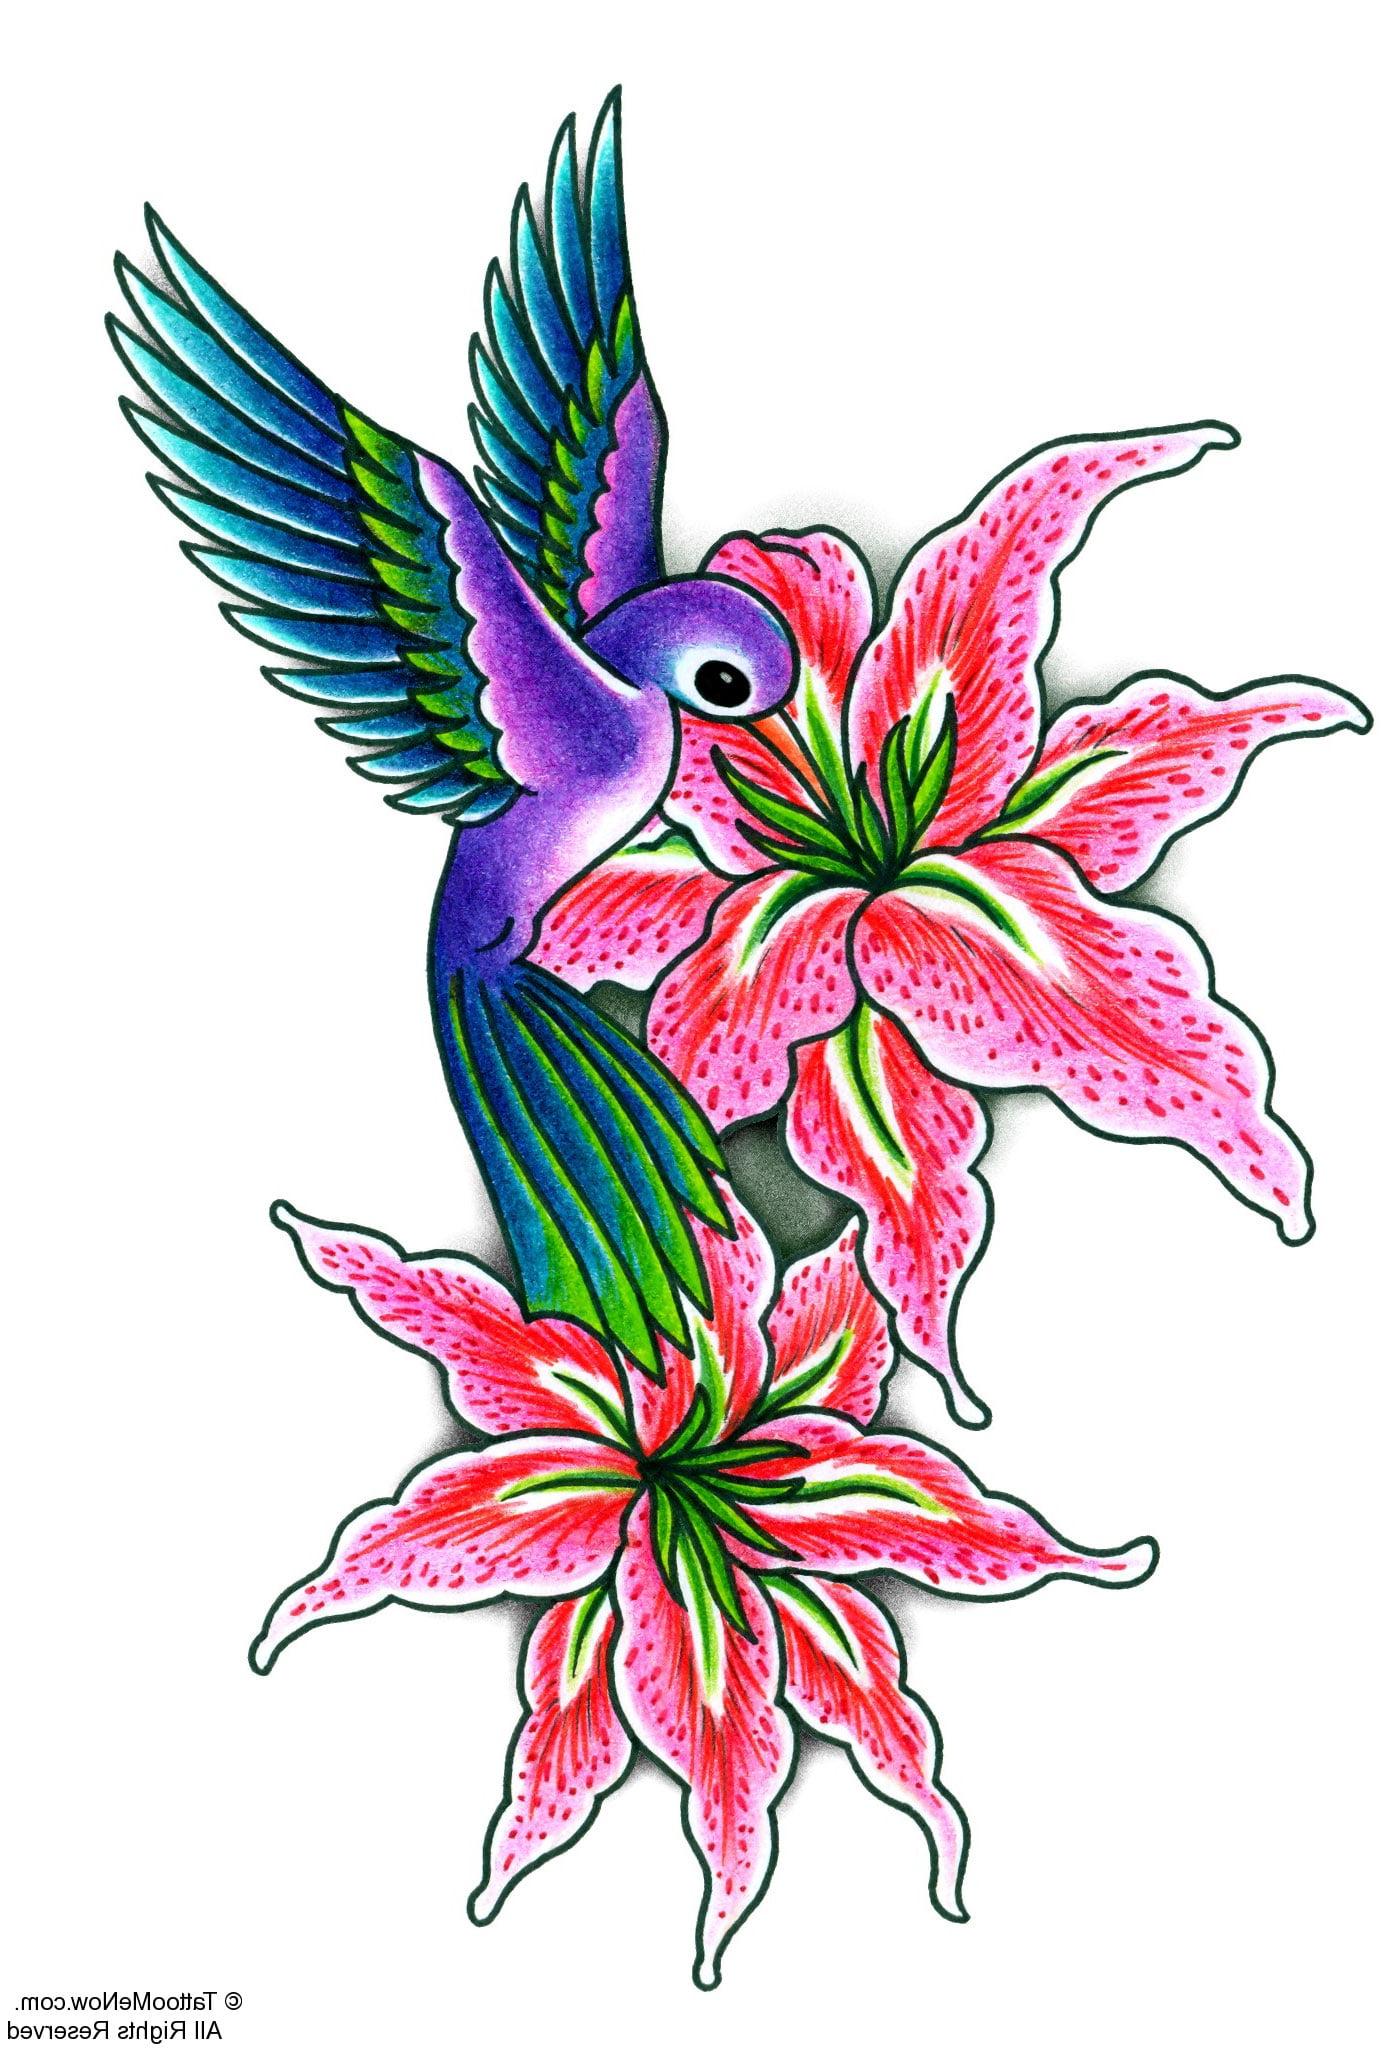 free rose tattoo stencils cool tattoos bonbaden. Black Bedroom Furniture Sets. Home Design Ideas